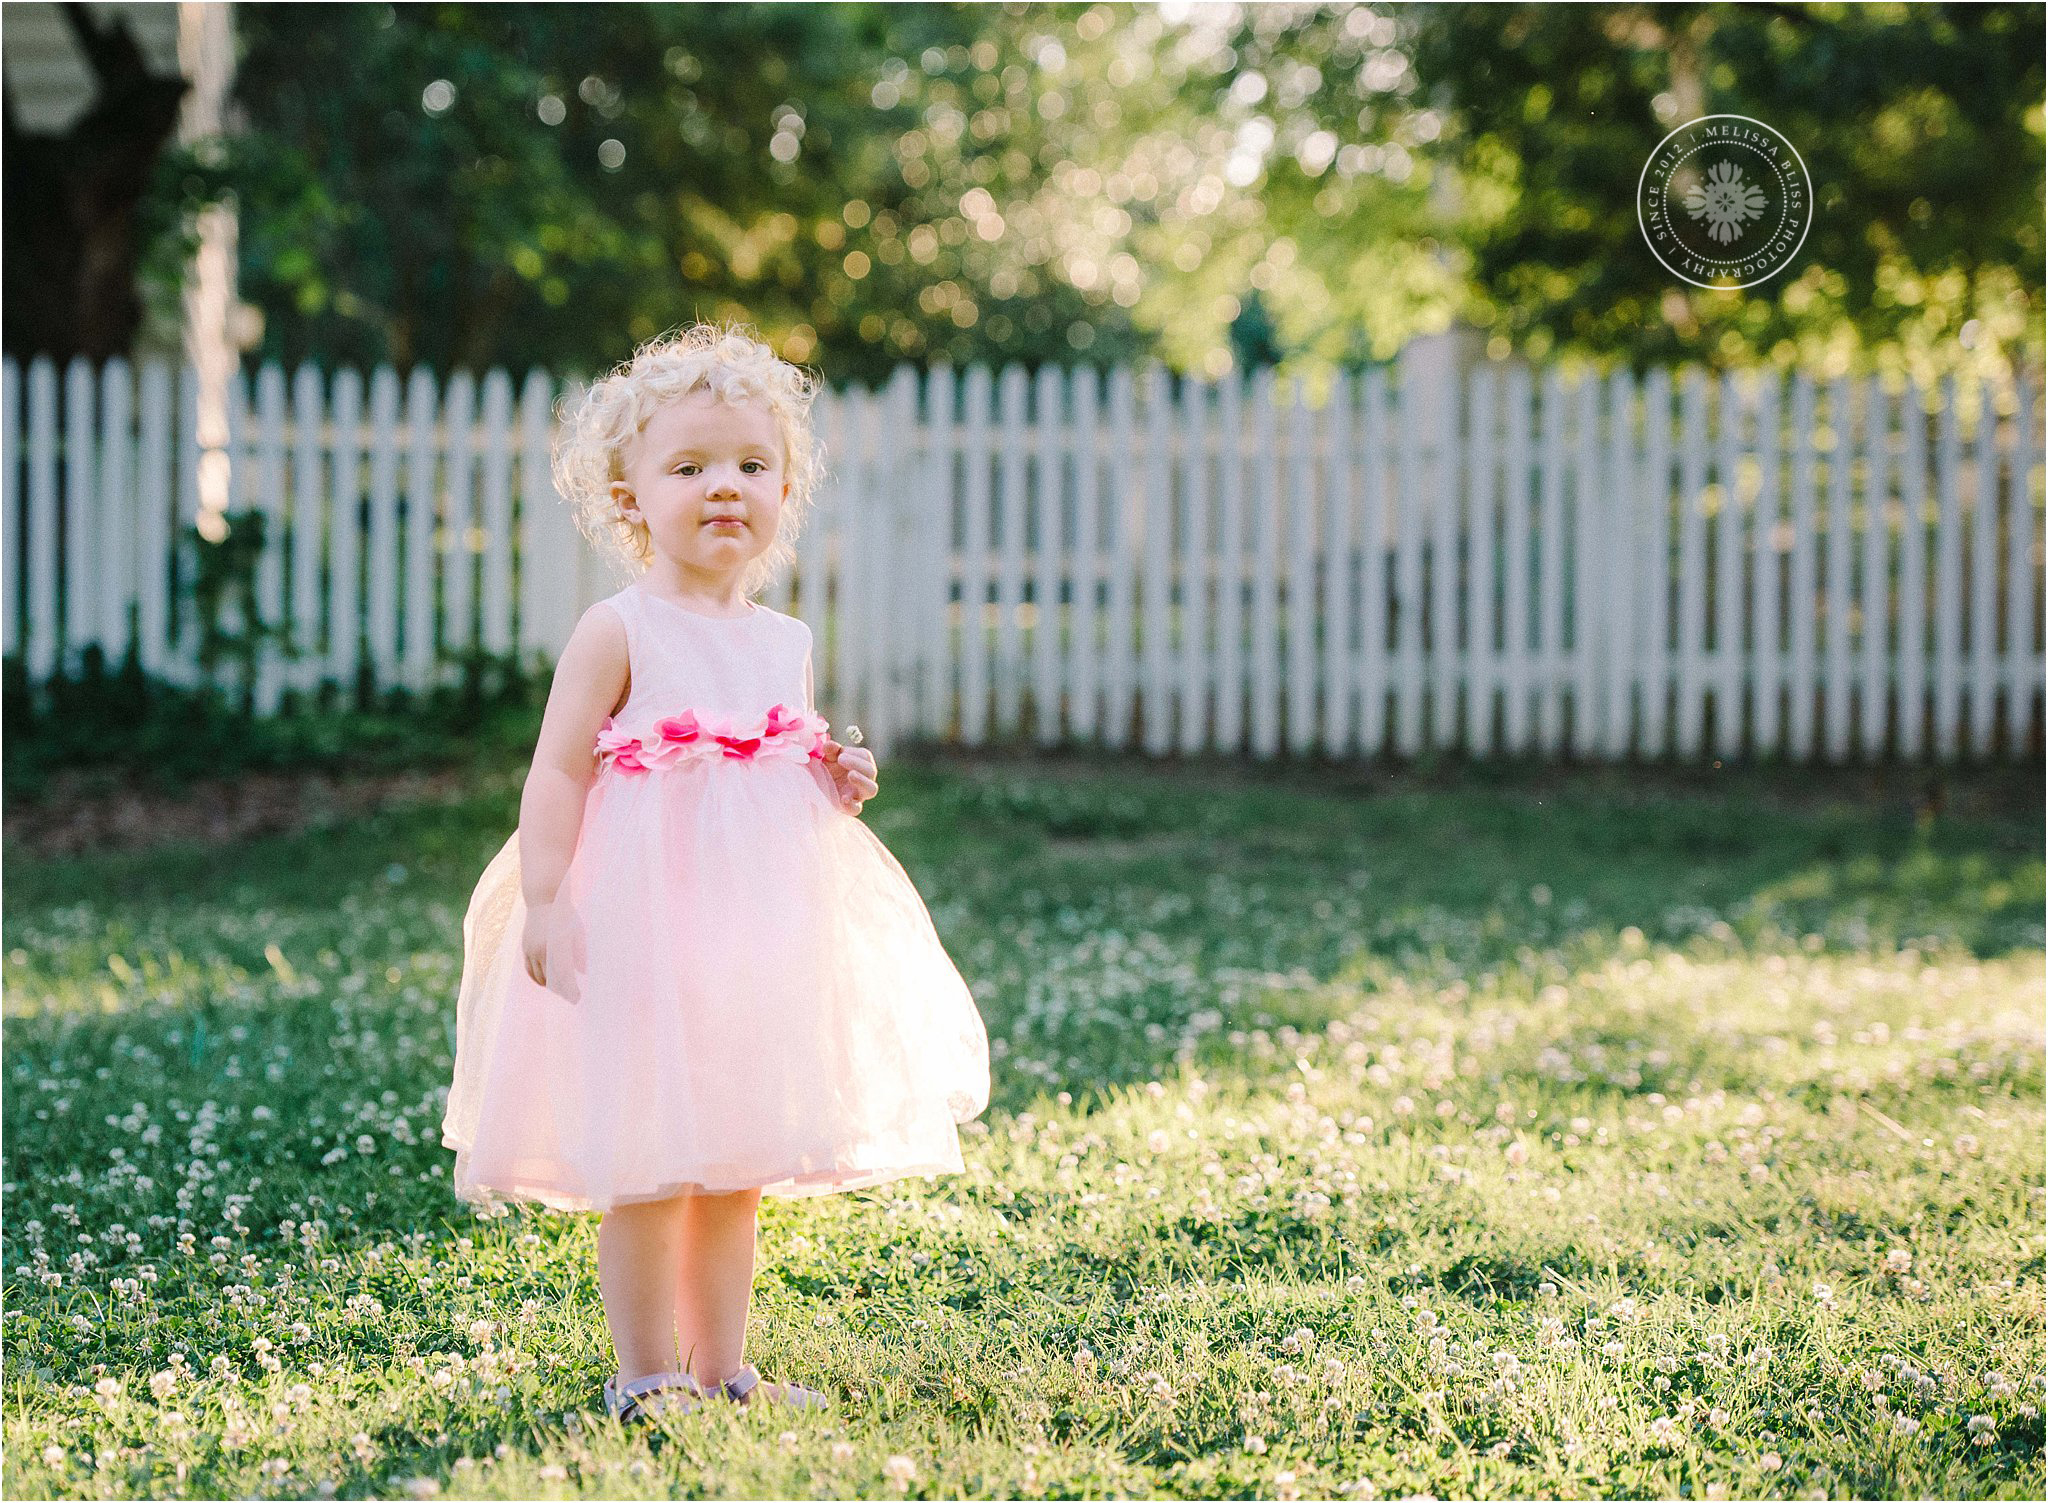 virginia-beach-norfolk-portsmouth-chesapeake-family-child-photographer-melissa-bliss-photography